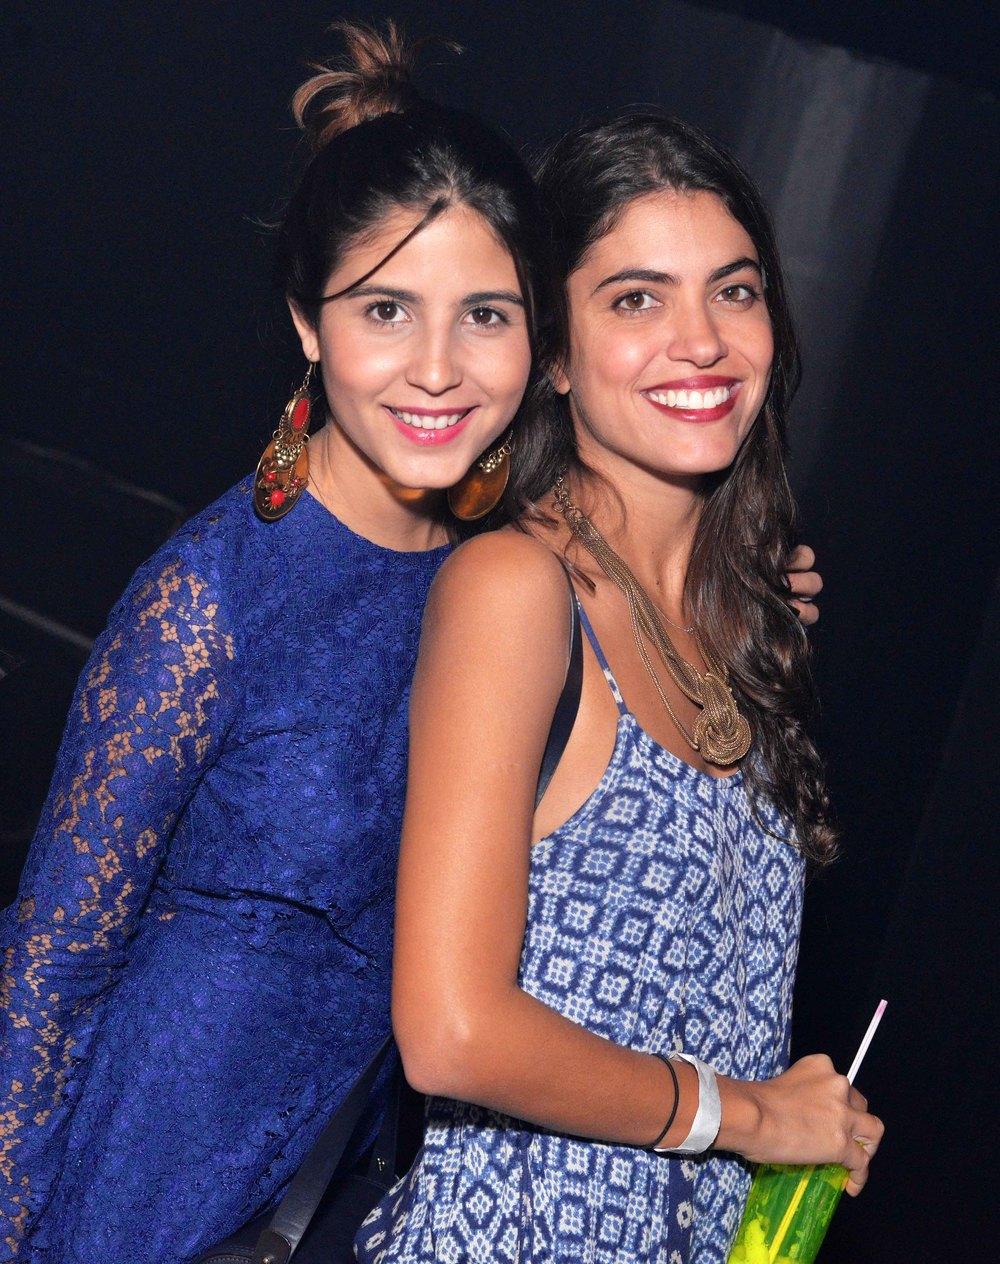 Beatriz Gontijo e Gabriela Macie.jpg